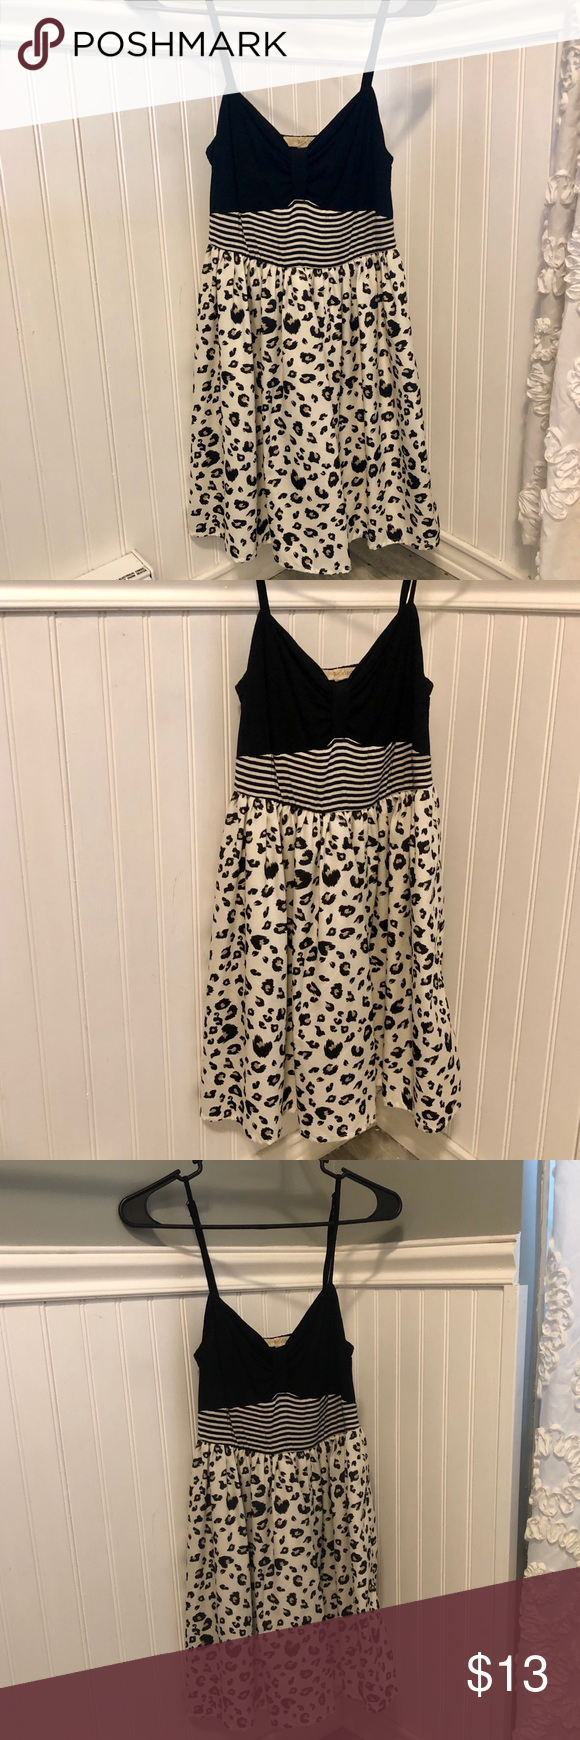 5 For 20 Black White Leopard Print Dress Leopard Print Dress Long Sleeve Shift Dress Sleeveless Knit Dress [ 1740 x 580 Pixel ]